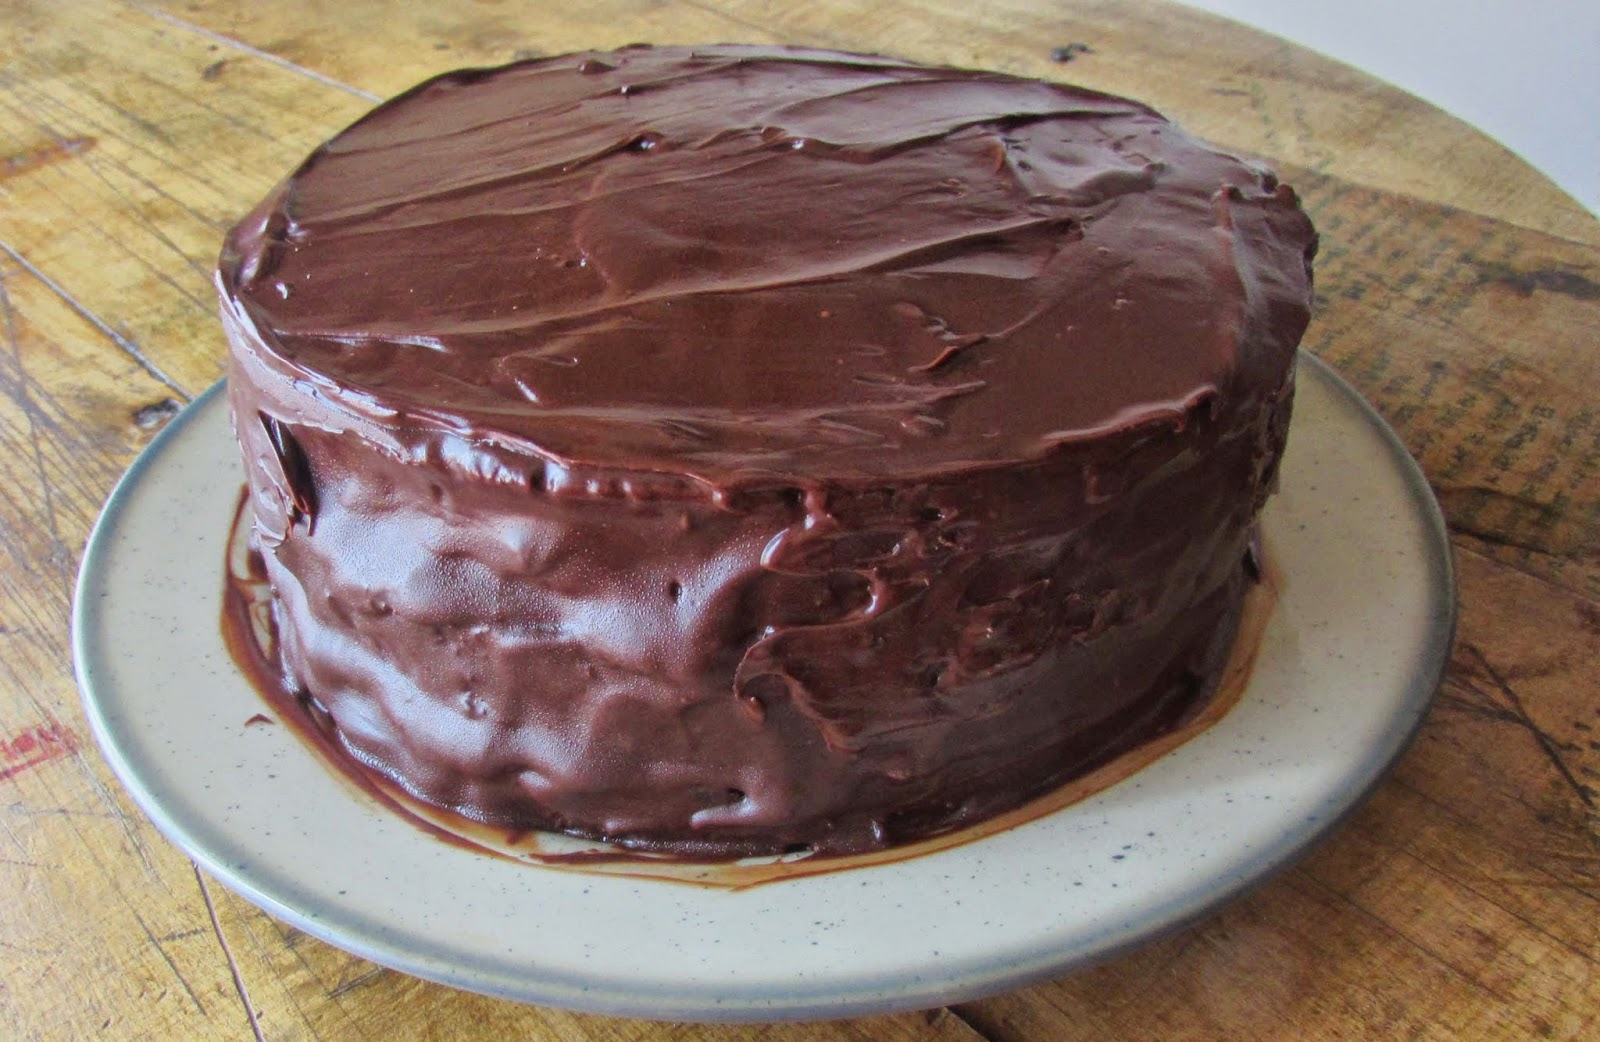 Tarta de chocolate y maracuyá, receta